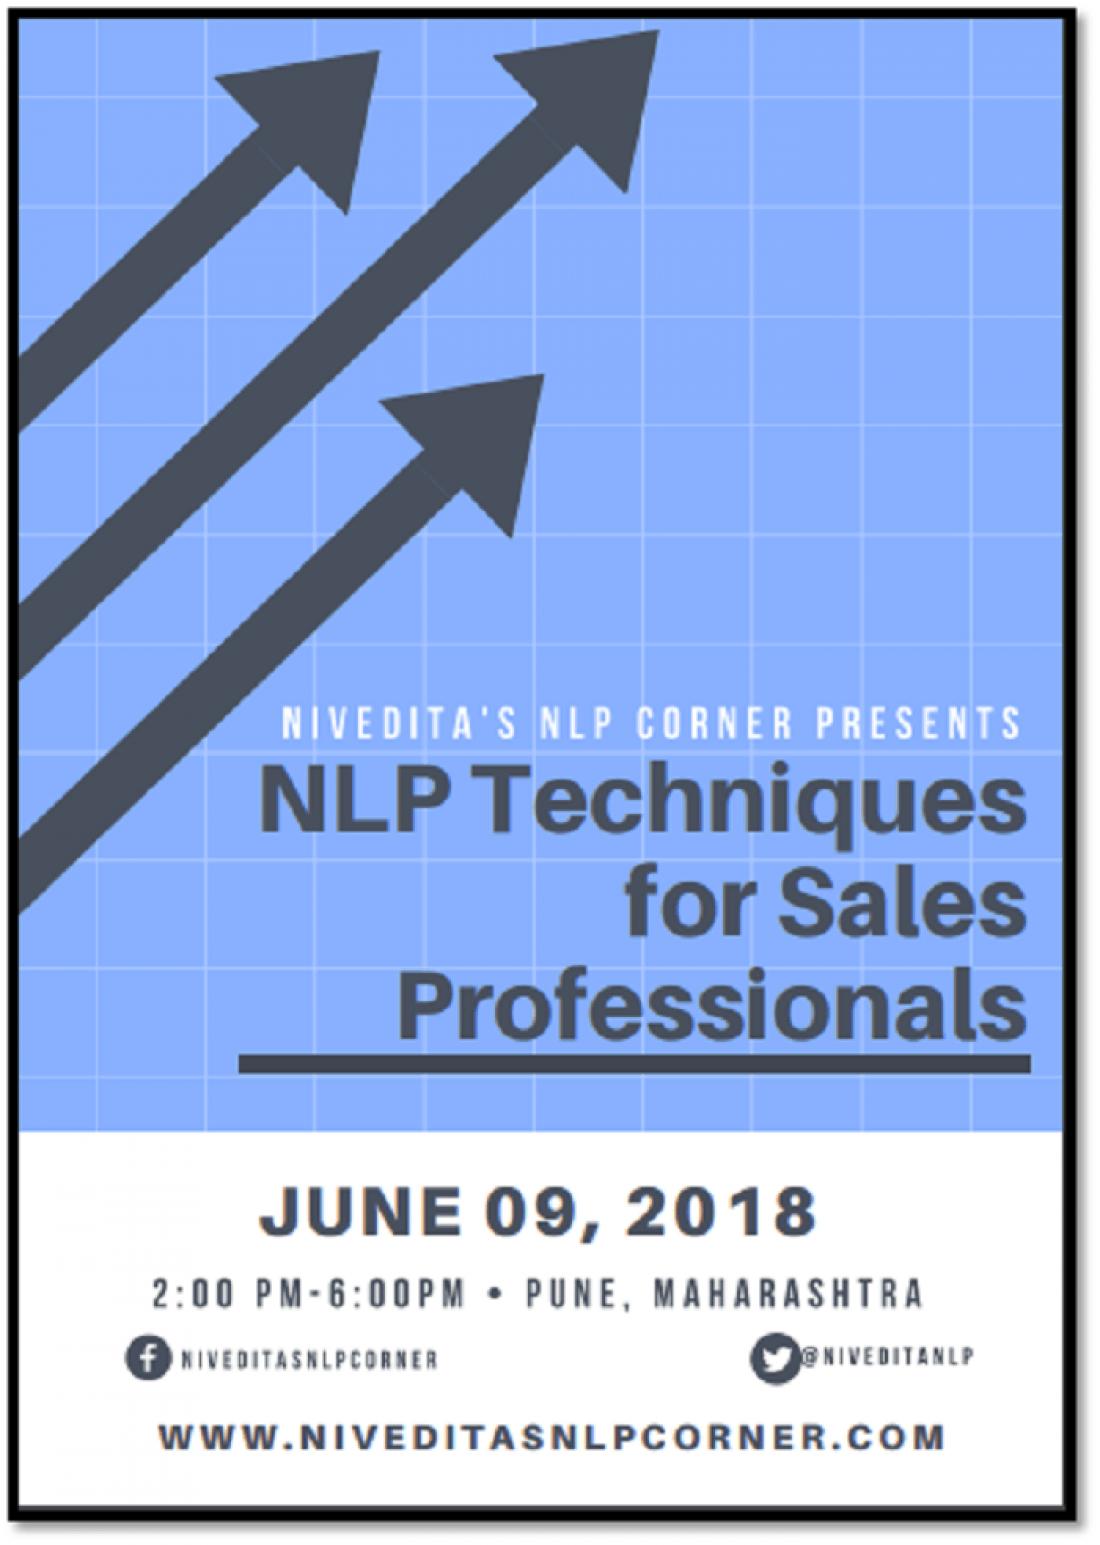 Nlp Techniques For Sales - NLP Practicioner